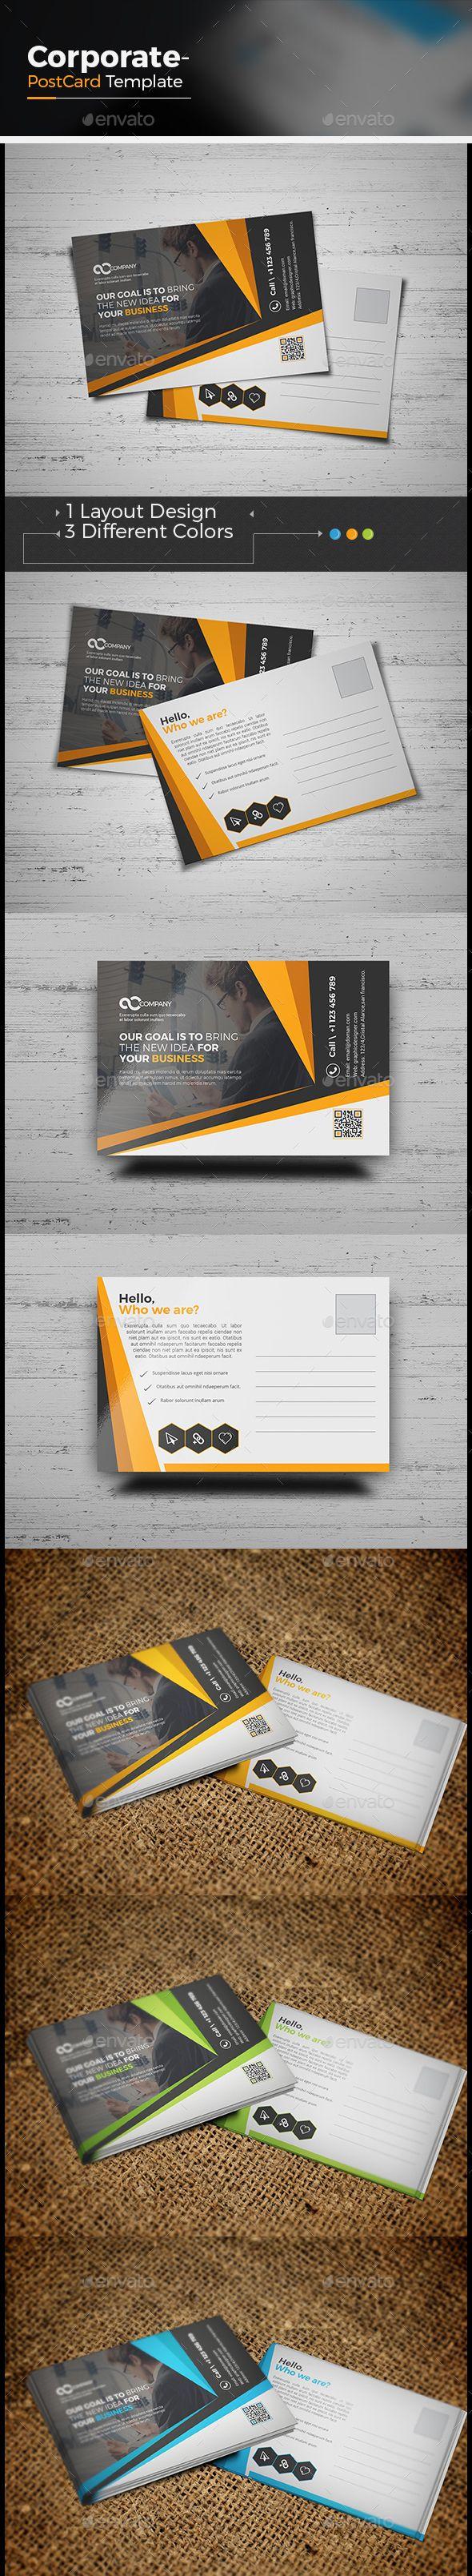 Corporate Business Postcard 78 best Design Layouts